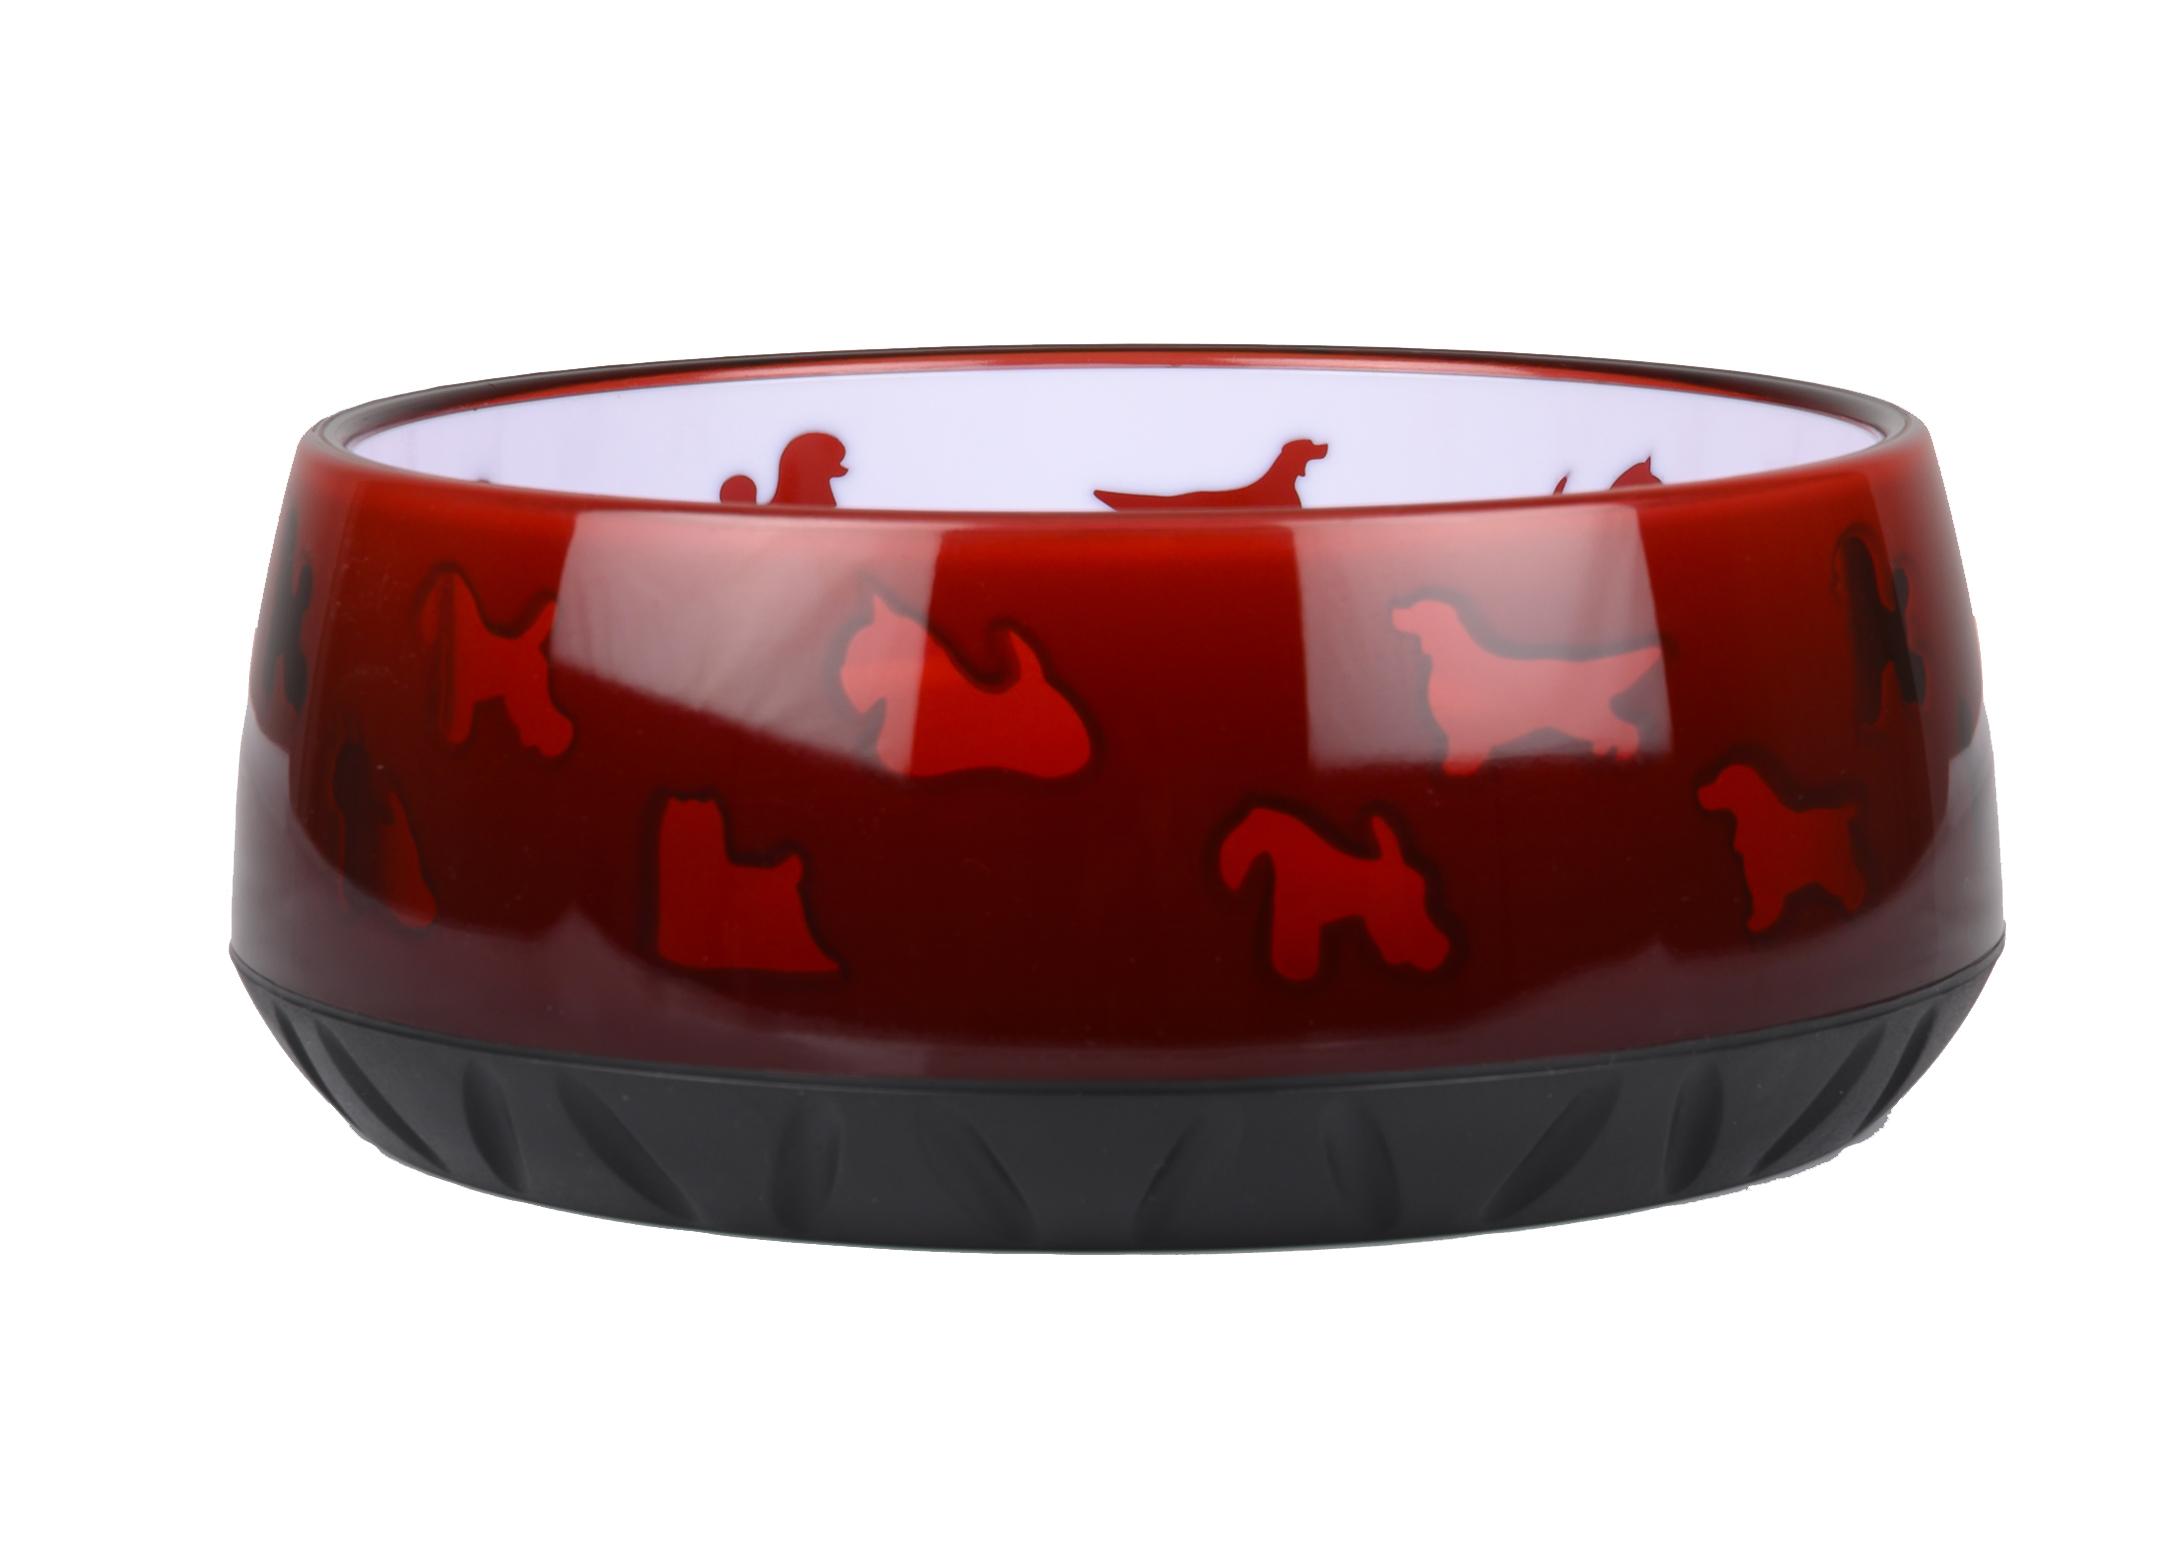 Show Tech K-Design Anti-Slip Bowl Red Large 21,6cm - 1,8L